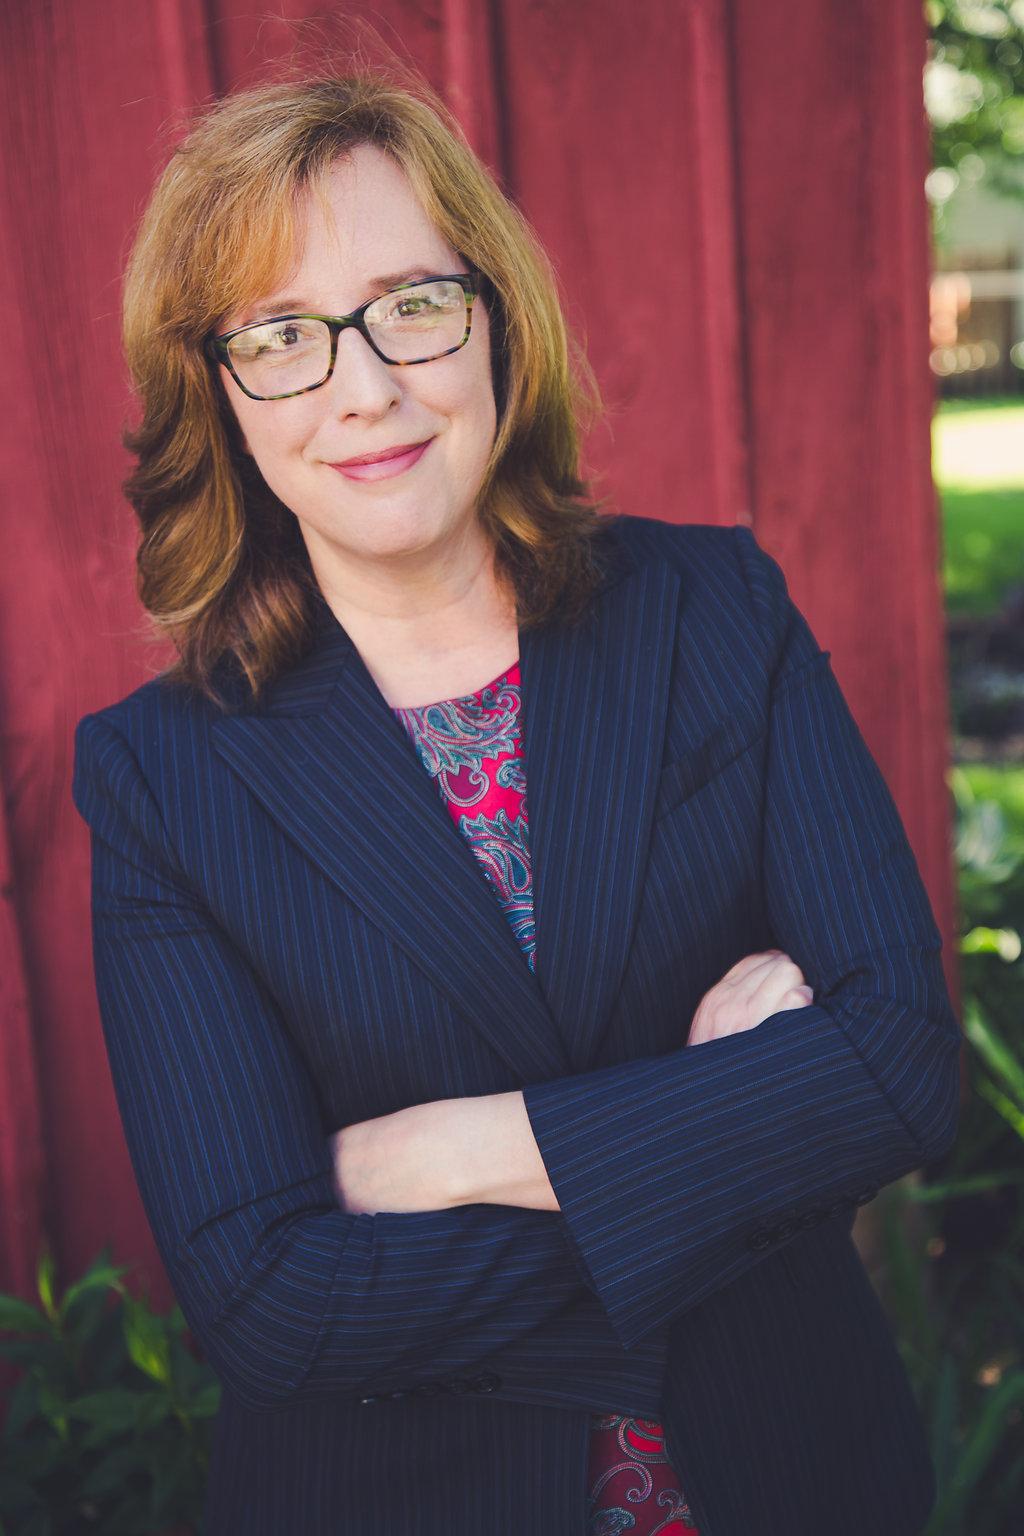 Anne Palzkill - Principal